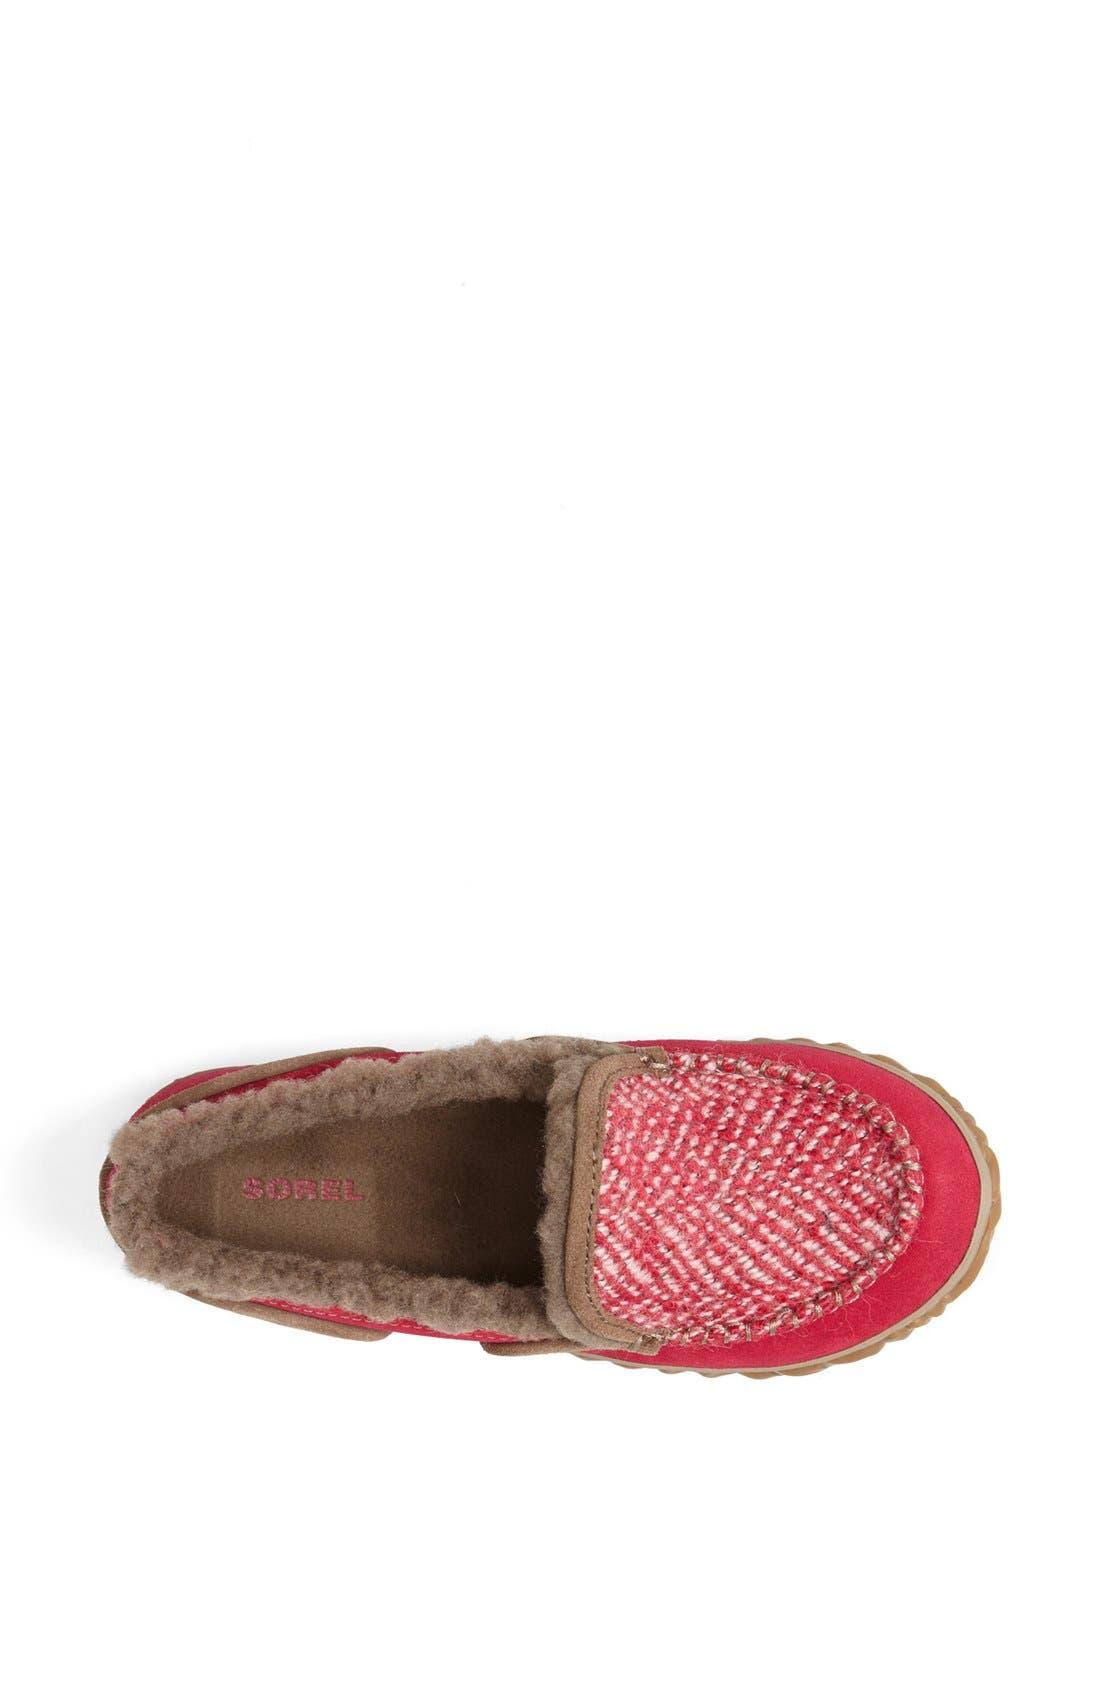 Alternate Image 3  - SOREL 'Tremblant' Slipper